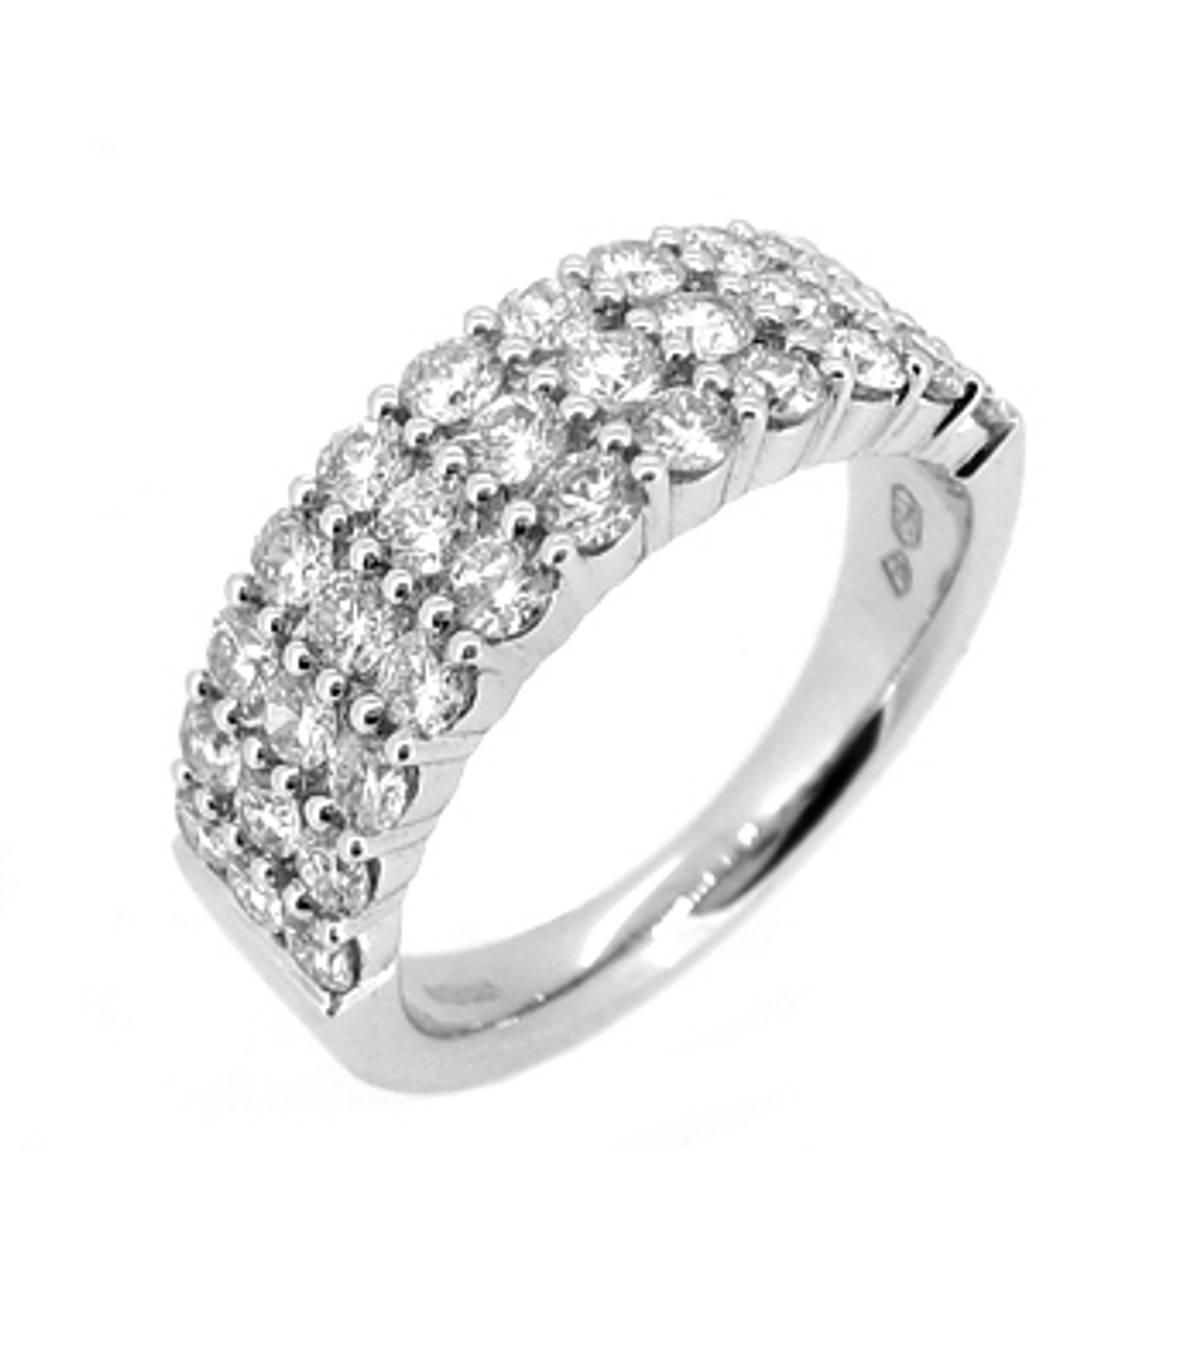 3 ROW DIAMOND FANCY RING 18k white gold 3 row diamond dress ringDETAILSCarat: total diamond weight 1.51ctsCut: Brilliant cutMetal: 18k white gold